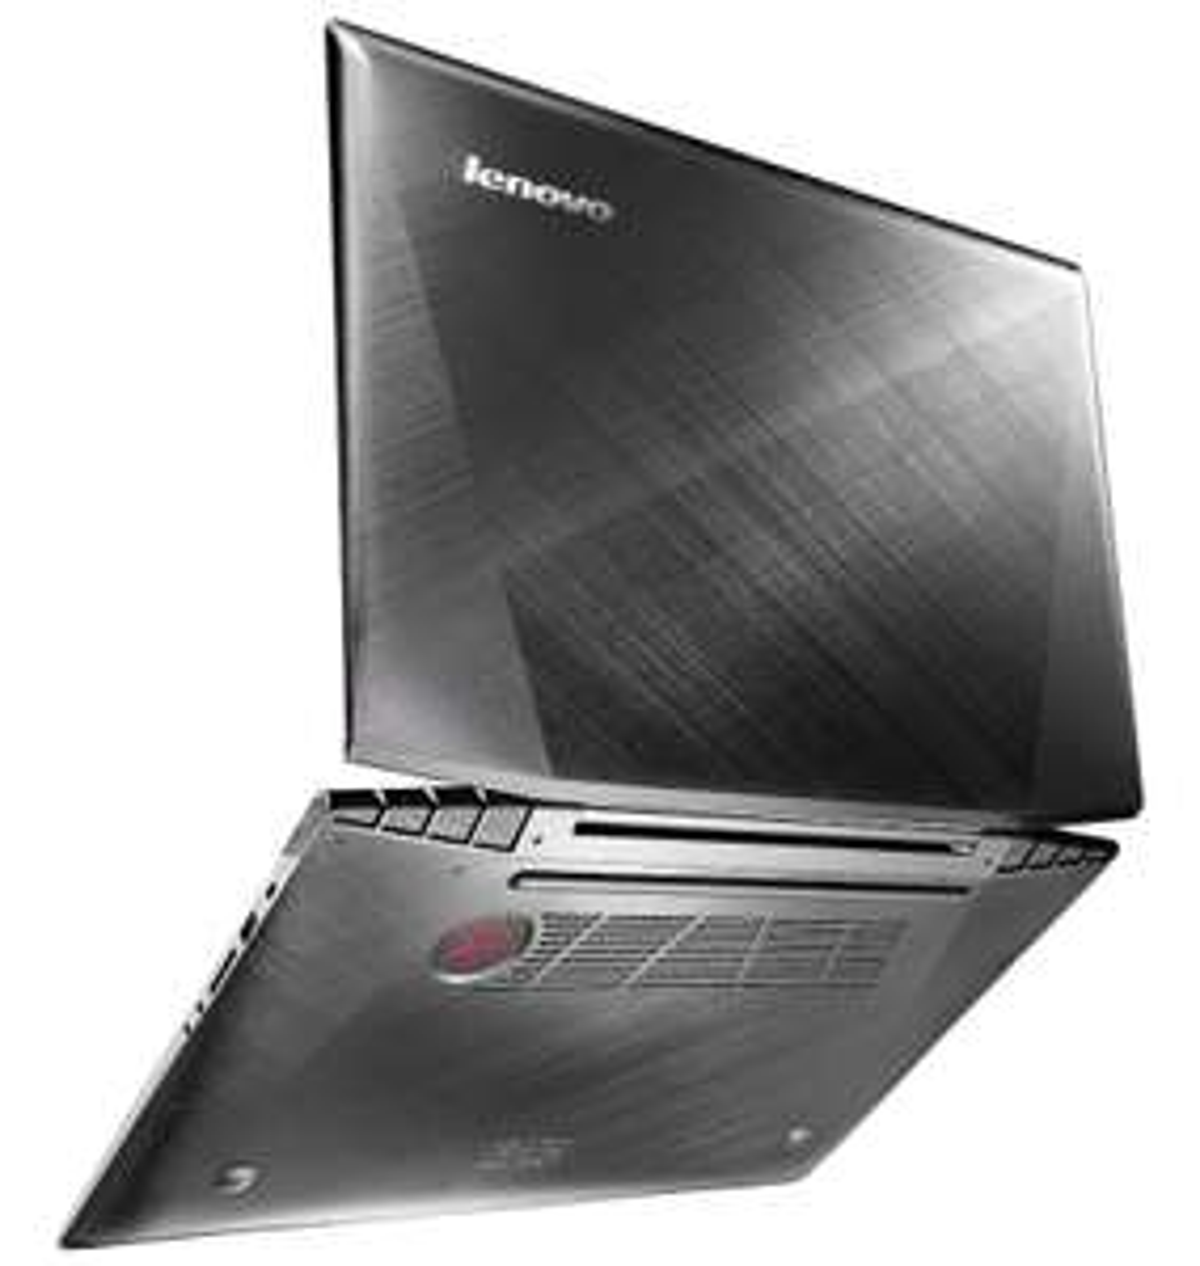 "PC portable tactile 17.3"" Lenovo Y70-70 80DU00CVFR - Core i7-4720HQ, Geforce GTX 960M, 8 Go RAM, 1 To + 8 Go SSHD (avec ODR TVA)"